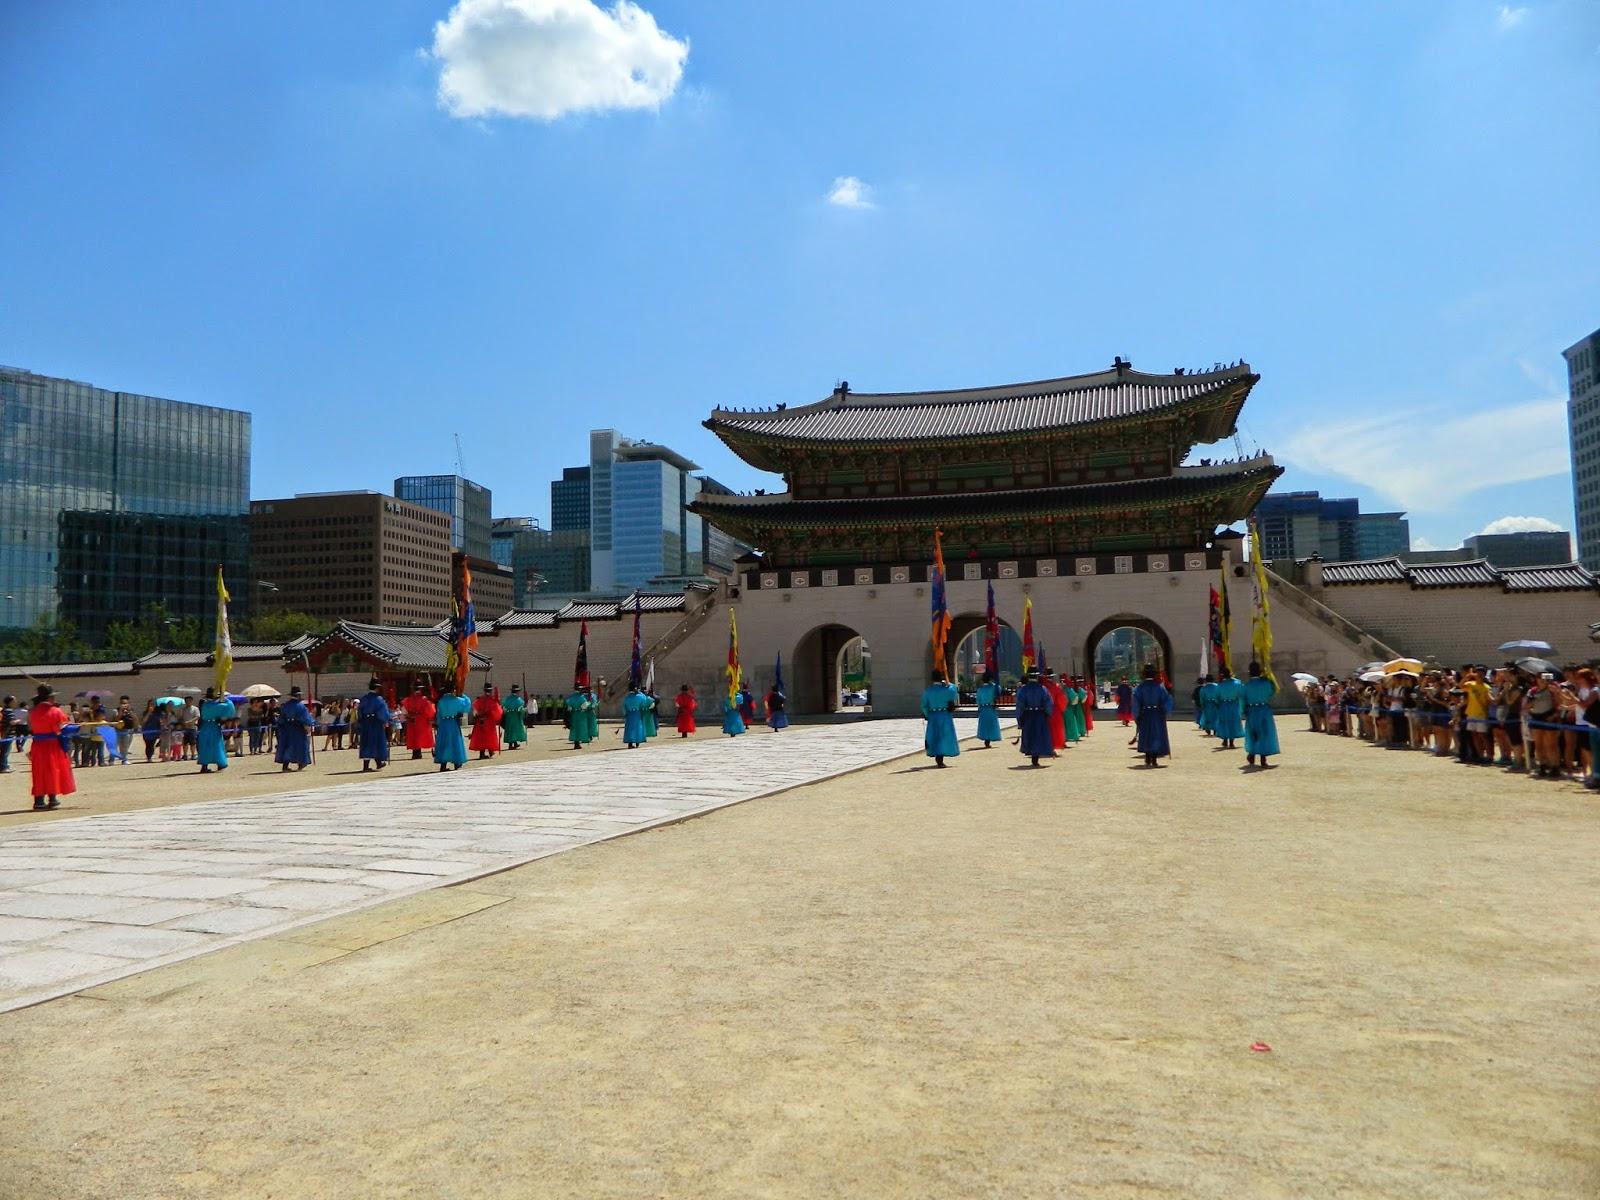 Gwangwhamun